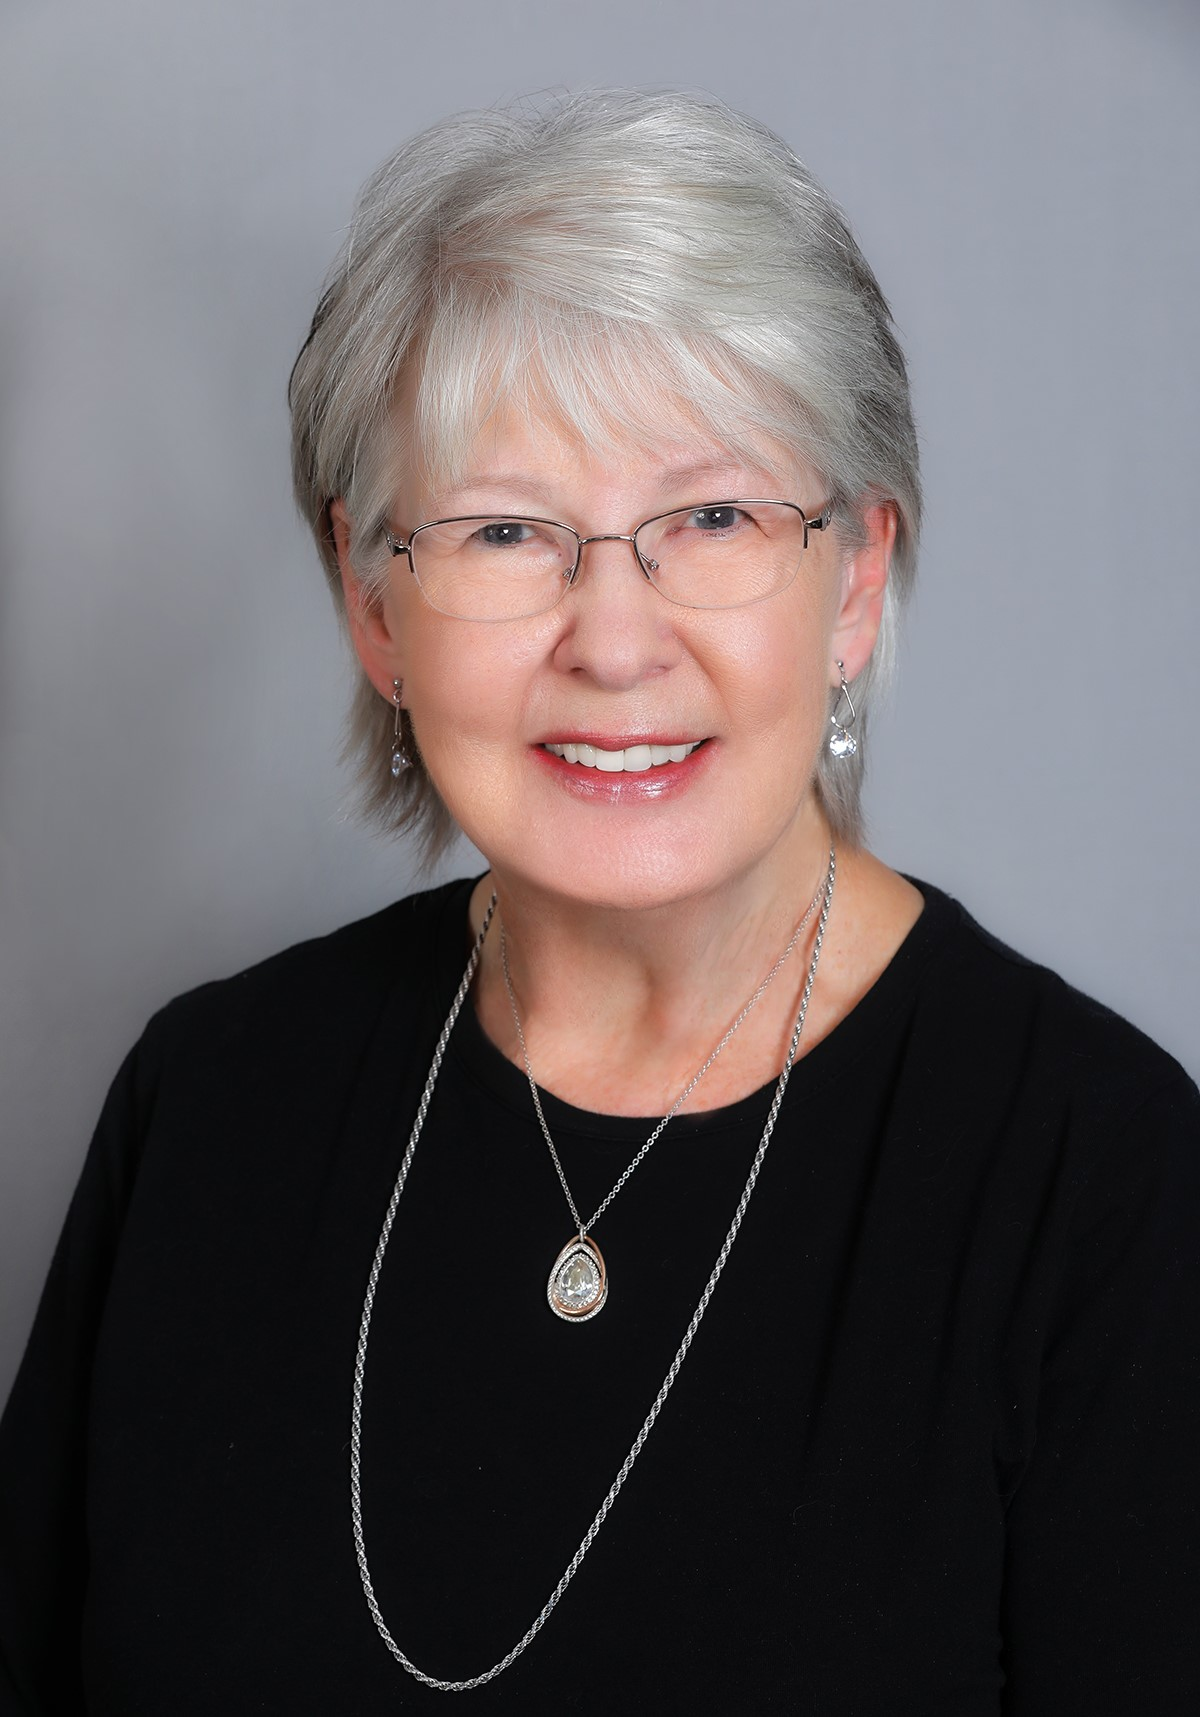 Nancy Nordenstrom